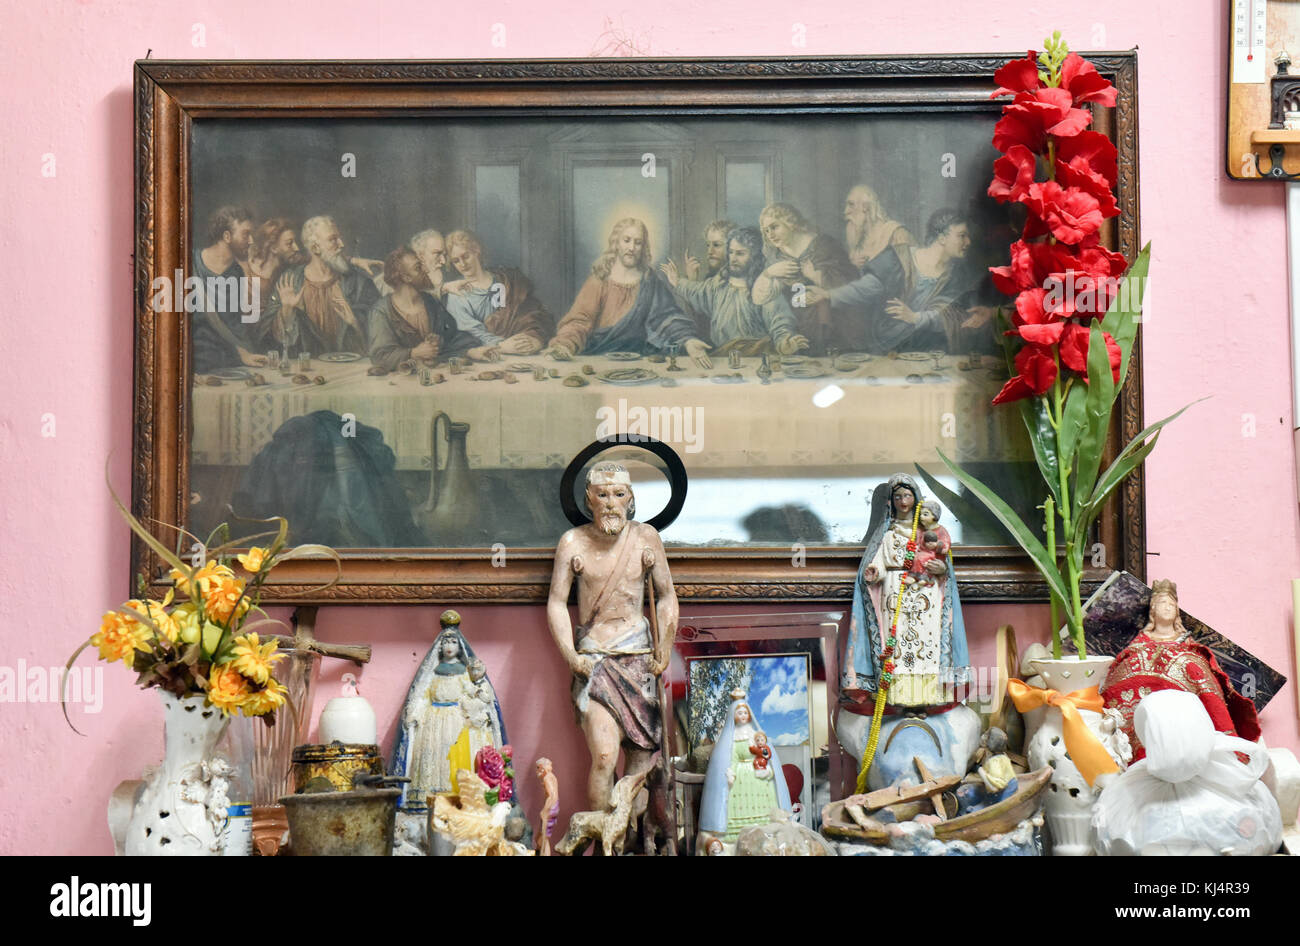 Vintage Souvenirs Stockfotos & Vintage Souvenirs Bilder - Alamy